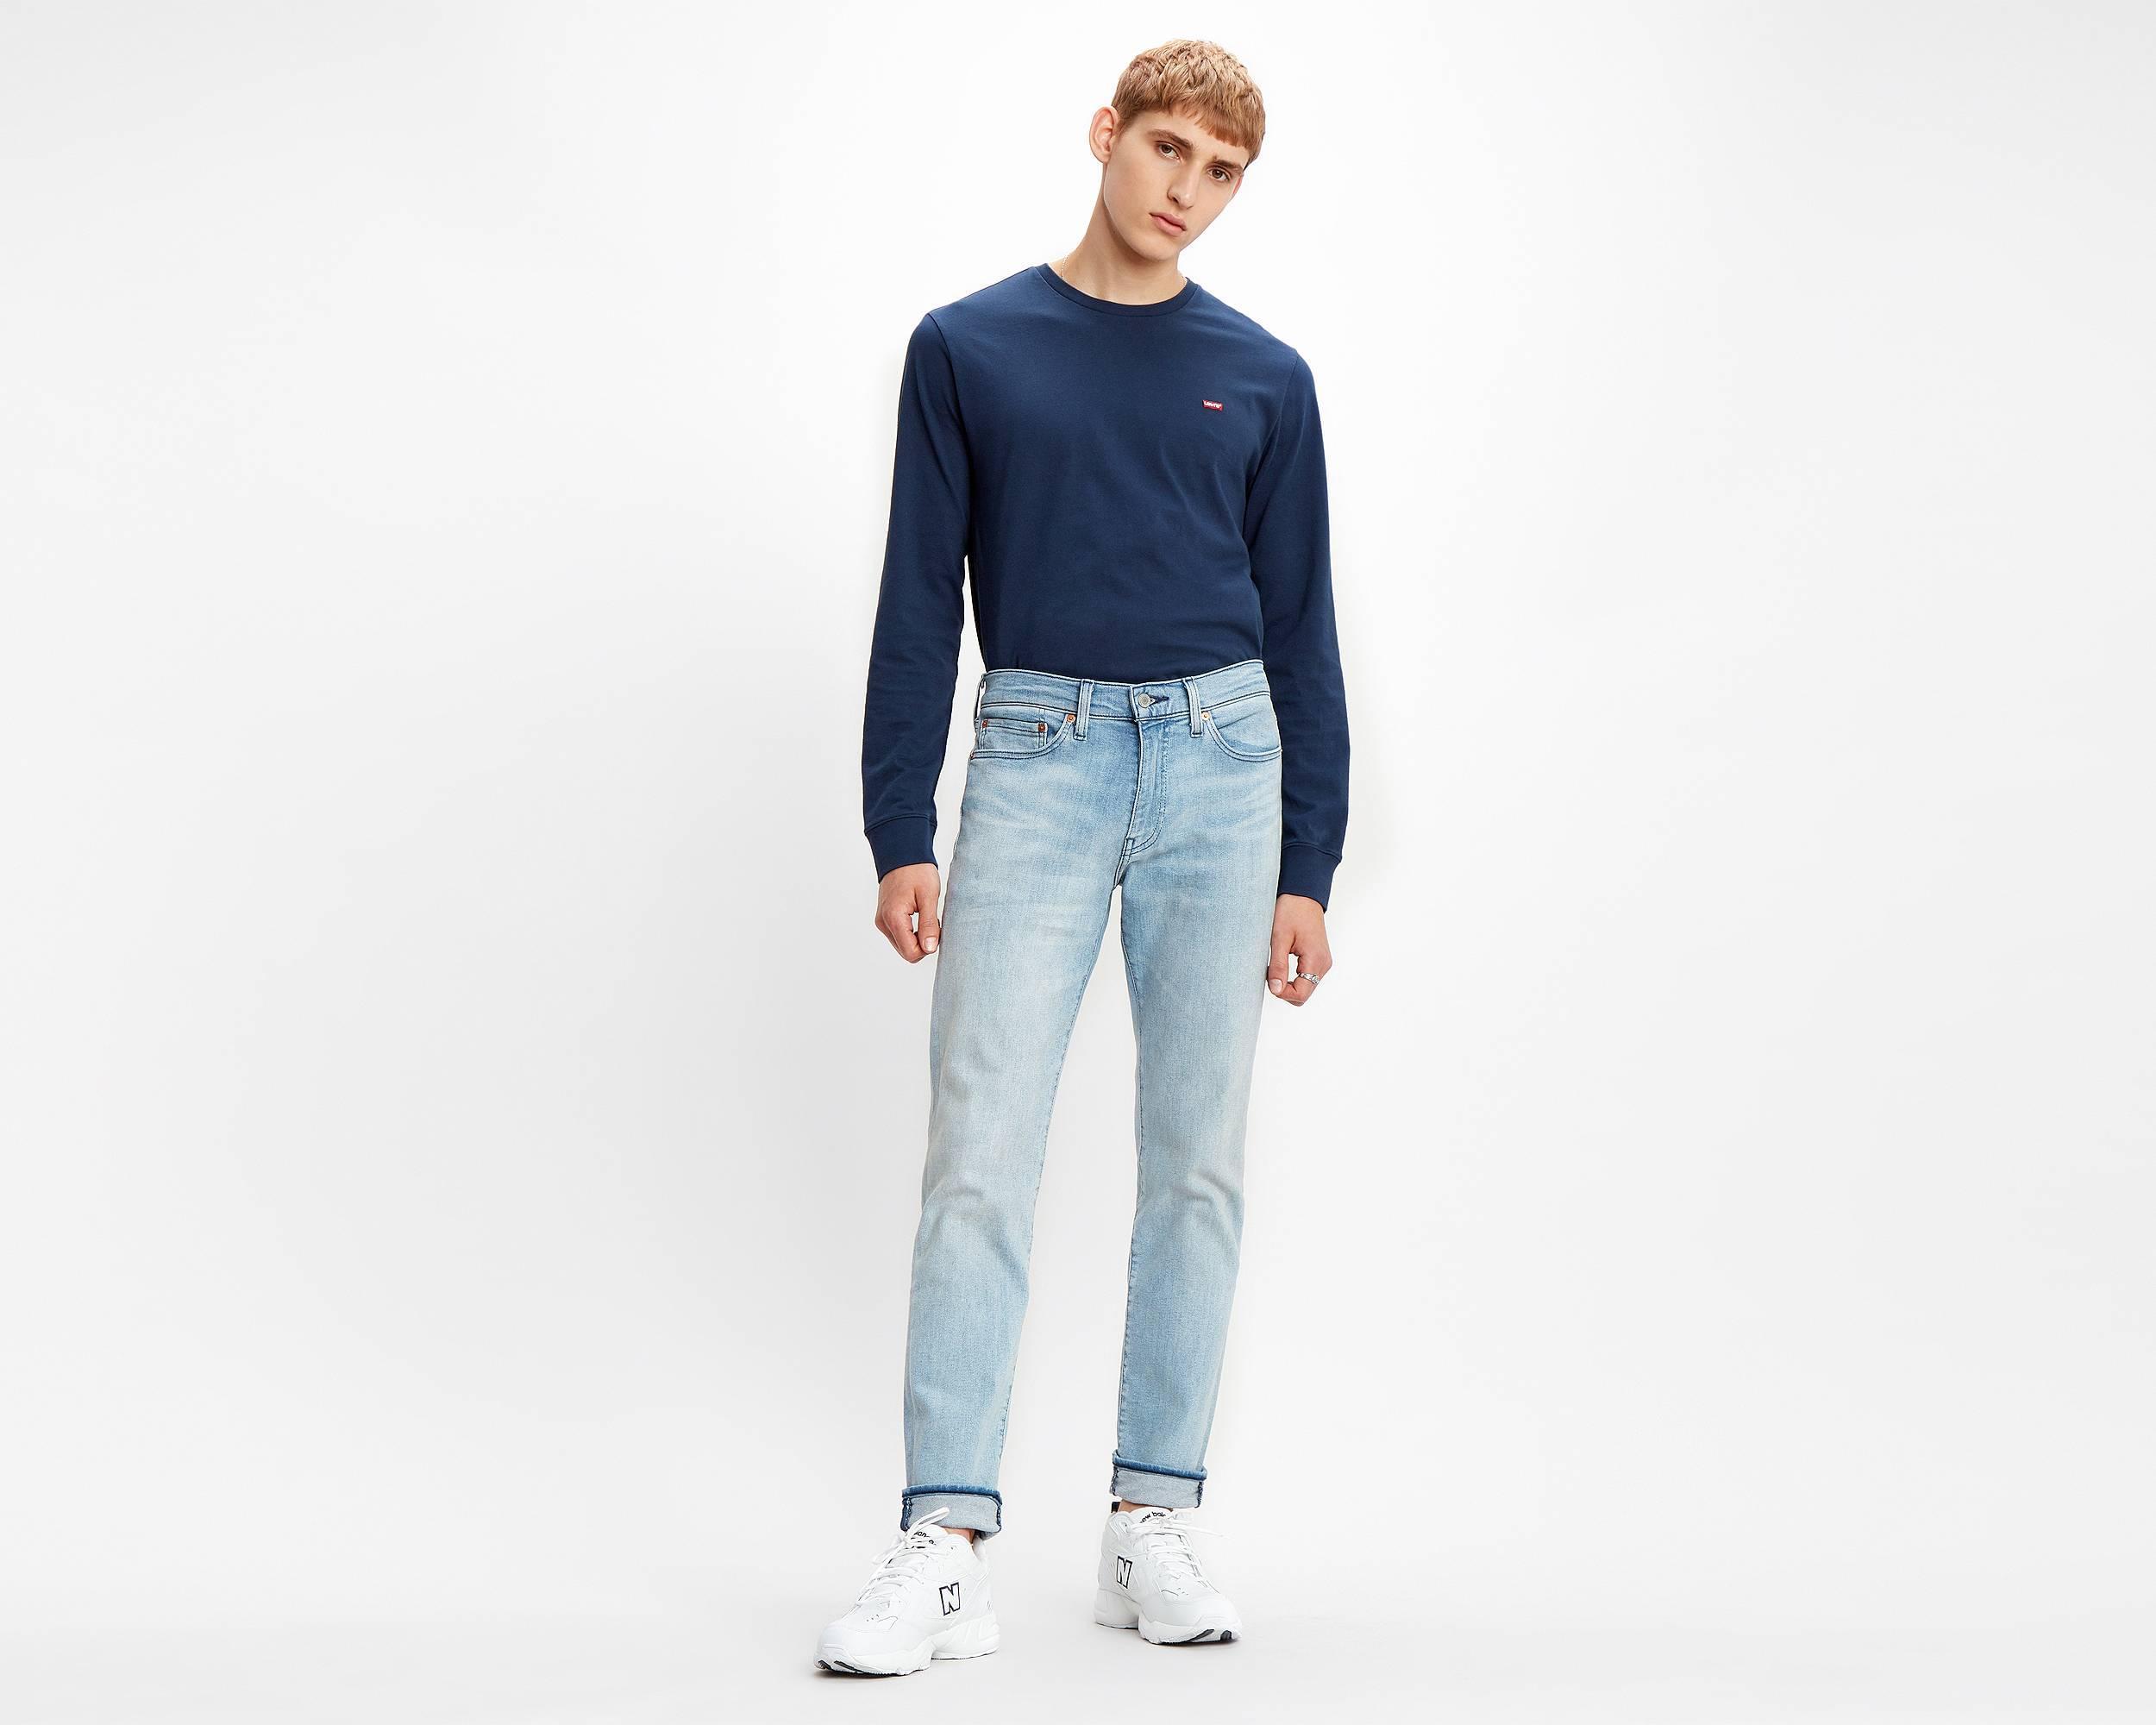 Especial 6XL Tamanho Grande Camisa Jeans Masculina Europa